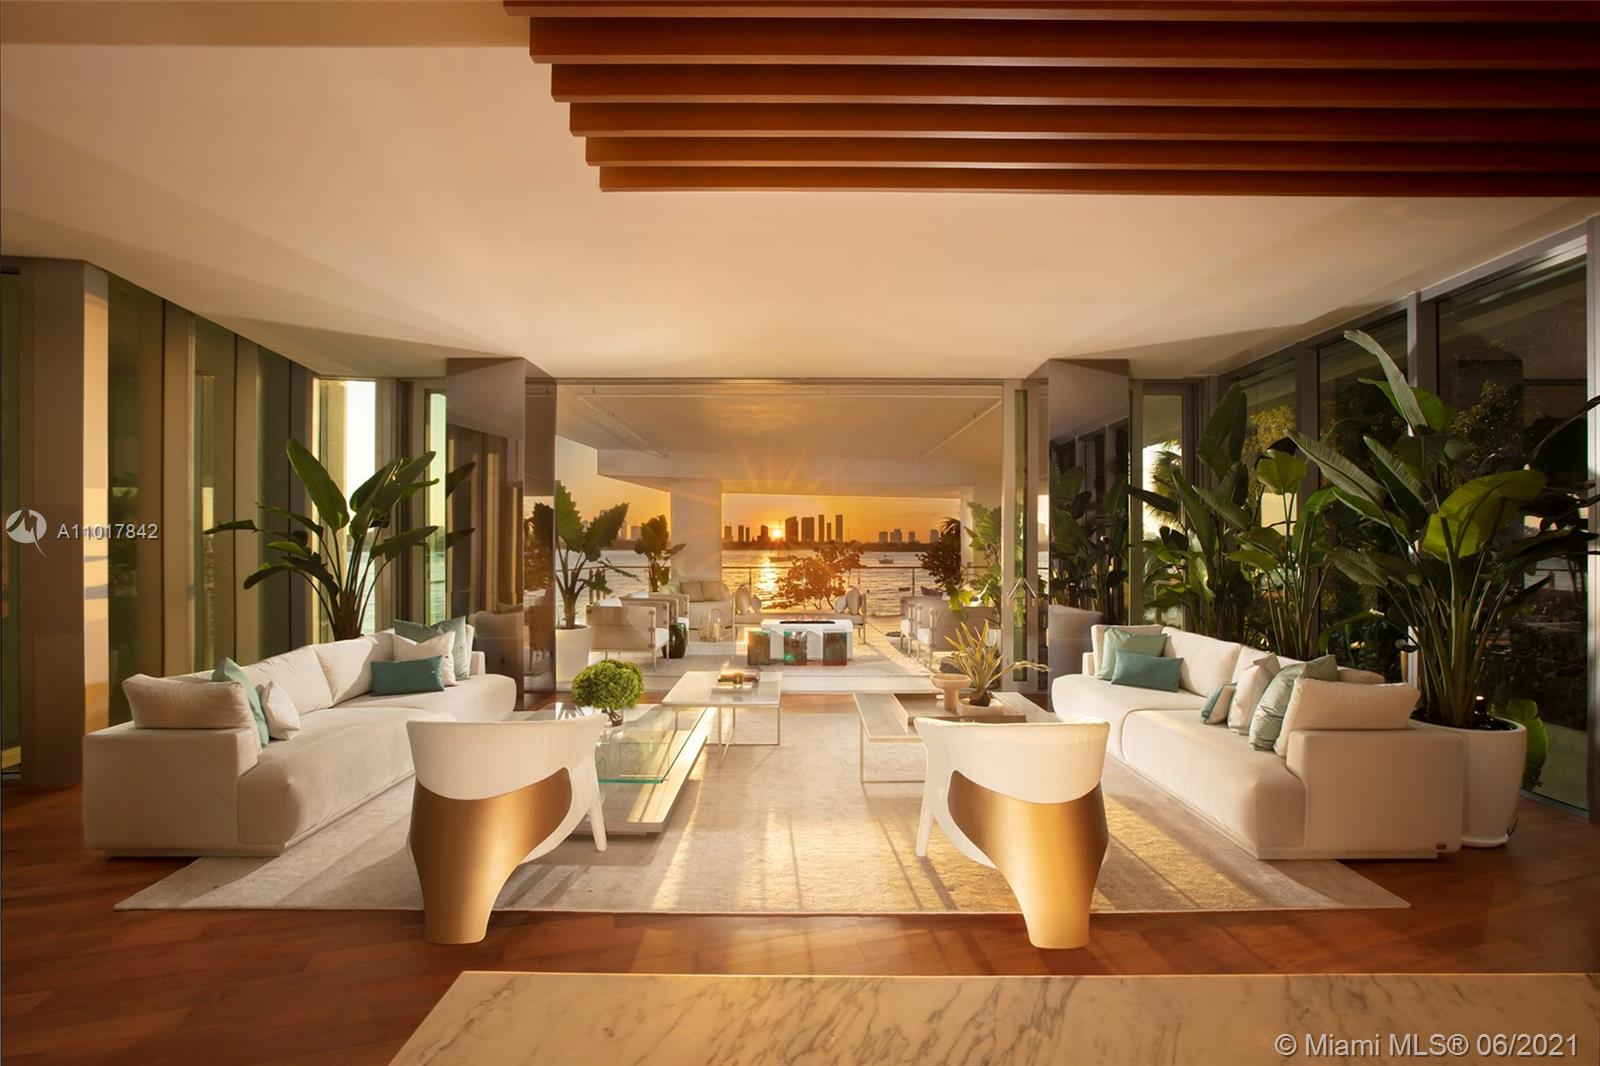 1300 Monad Terrace Unit 1 A, Miami Beach, Florida 33139